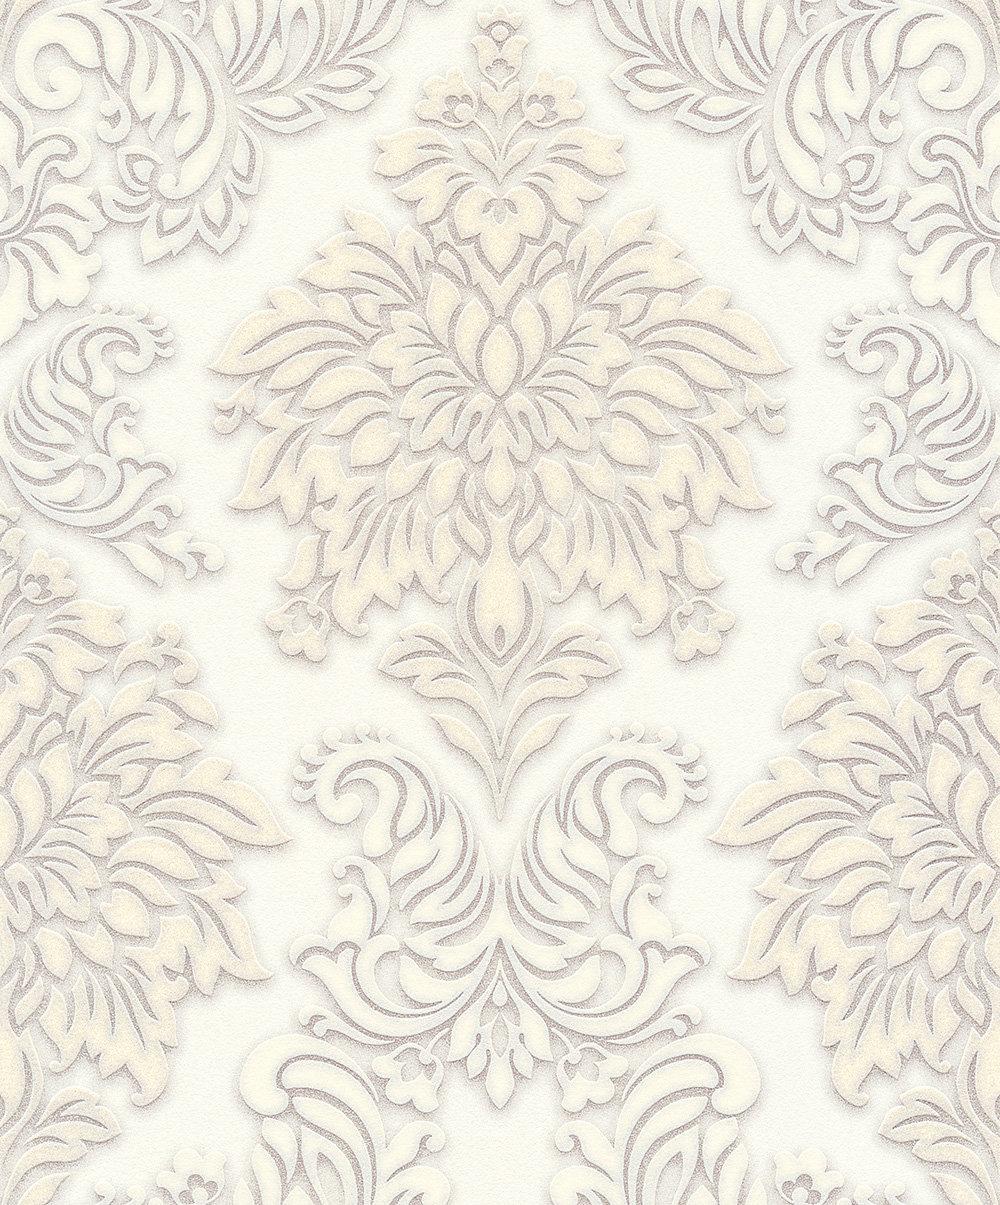 Metropolitan Stories Contemporary Damask White Wallpaper - Product code: 36898-2